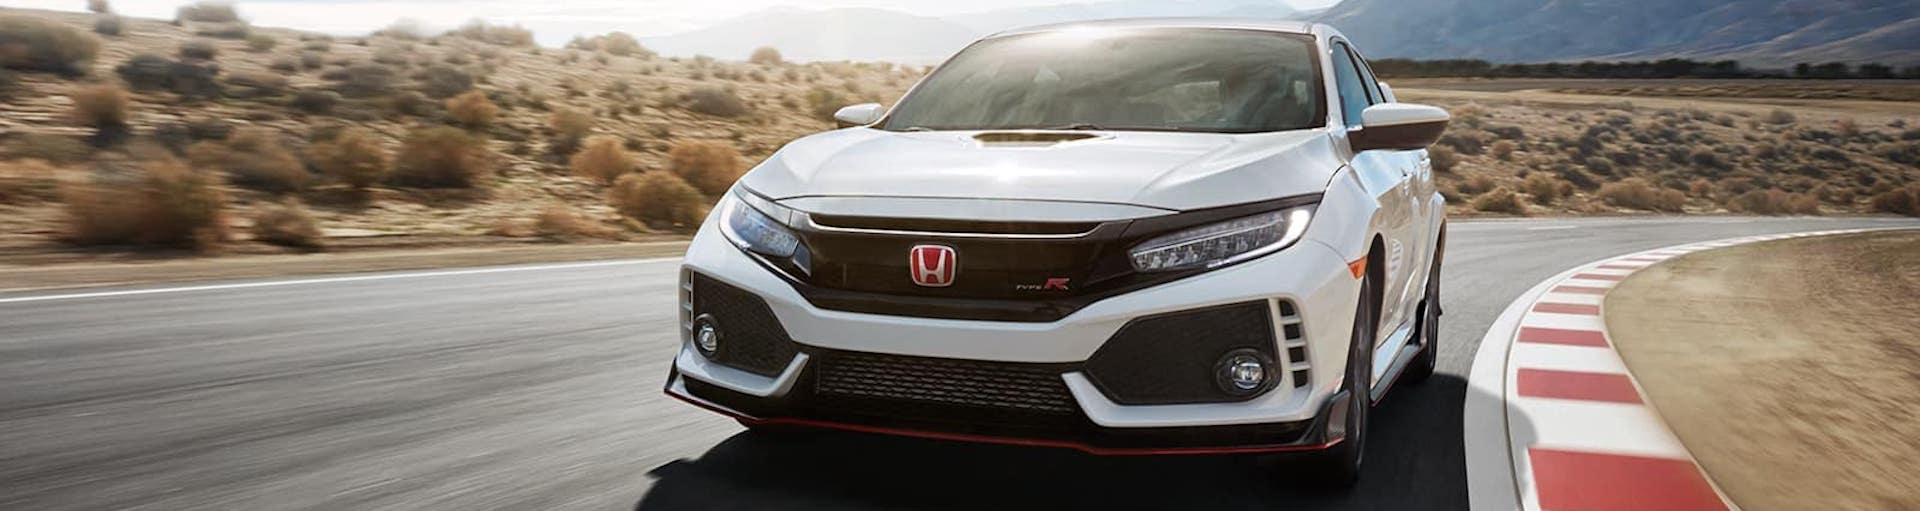 Honda 30,000 Mile Service